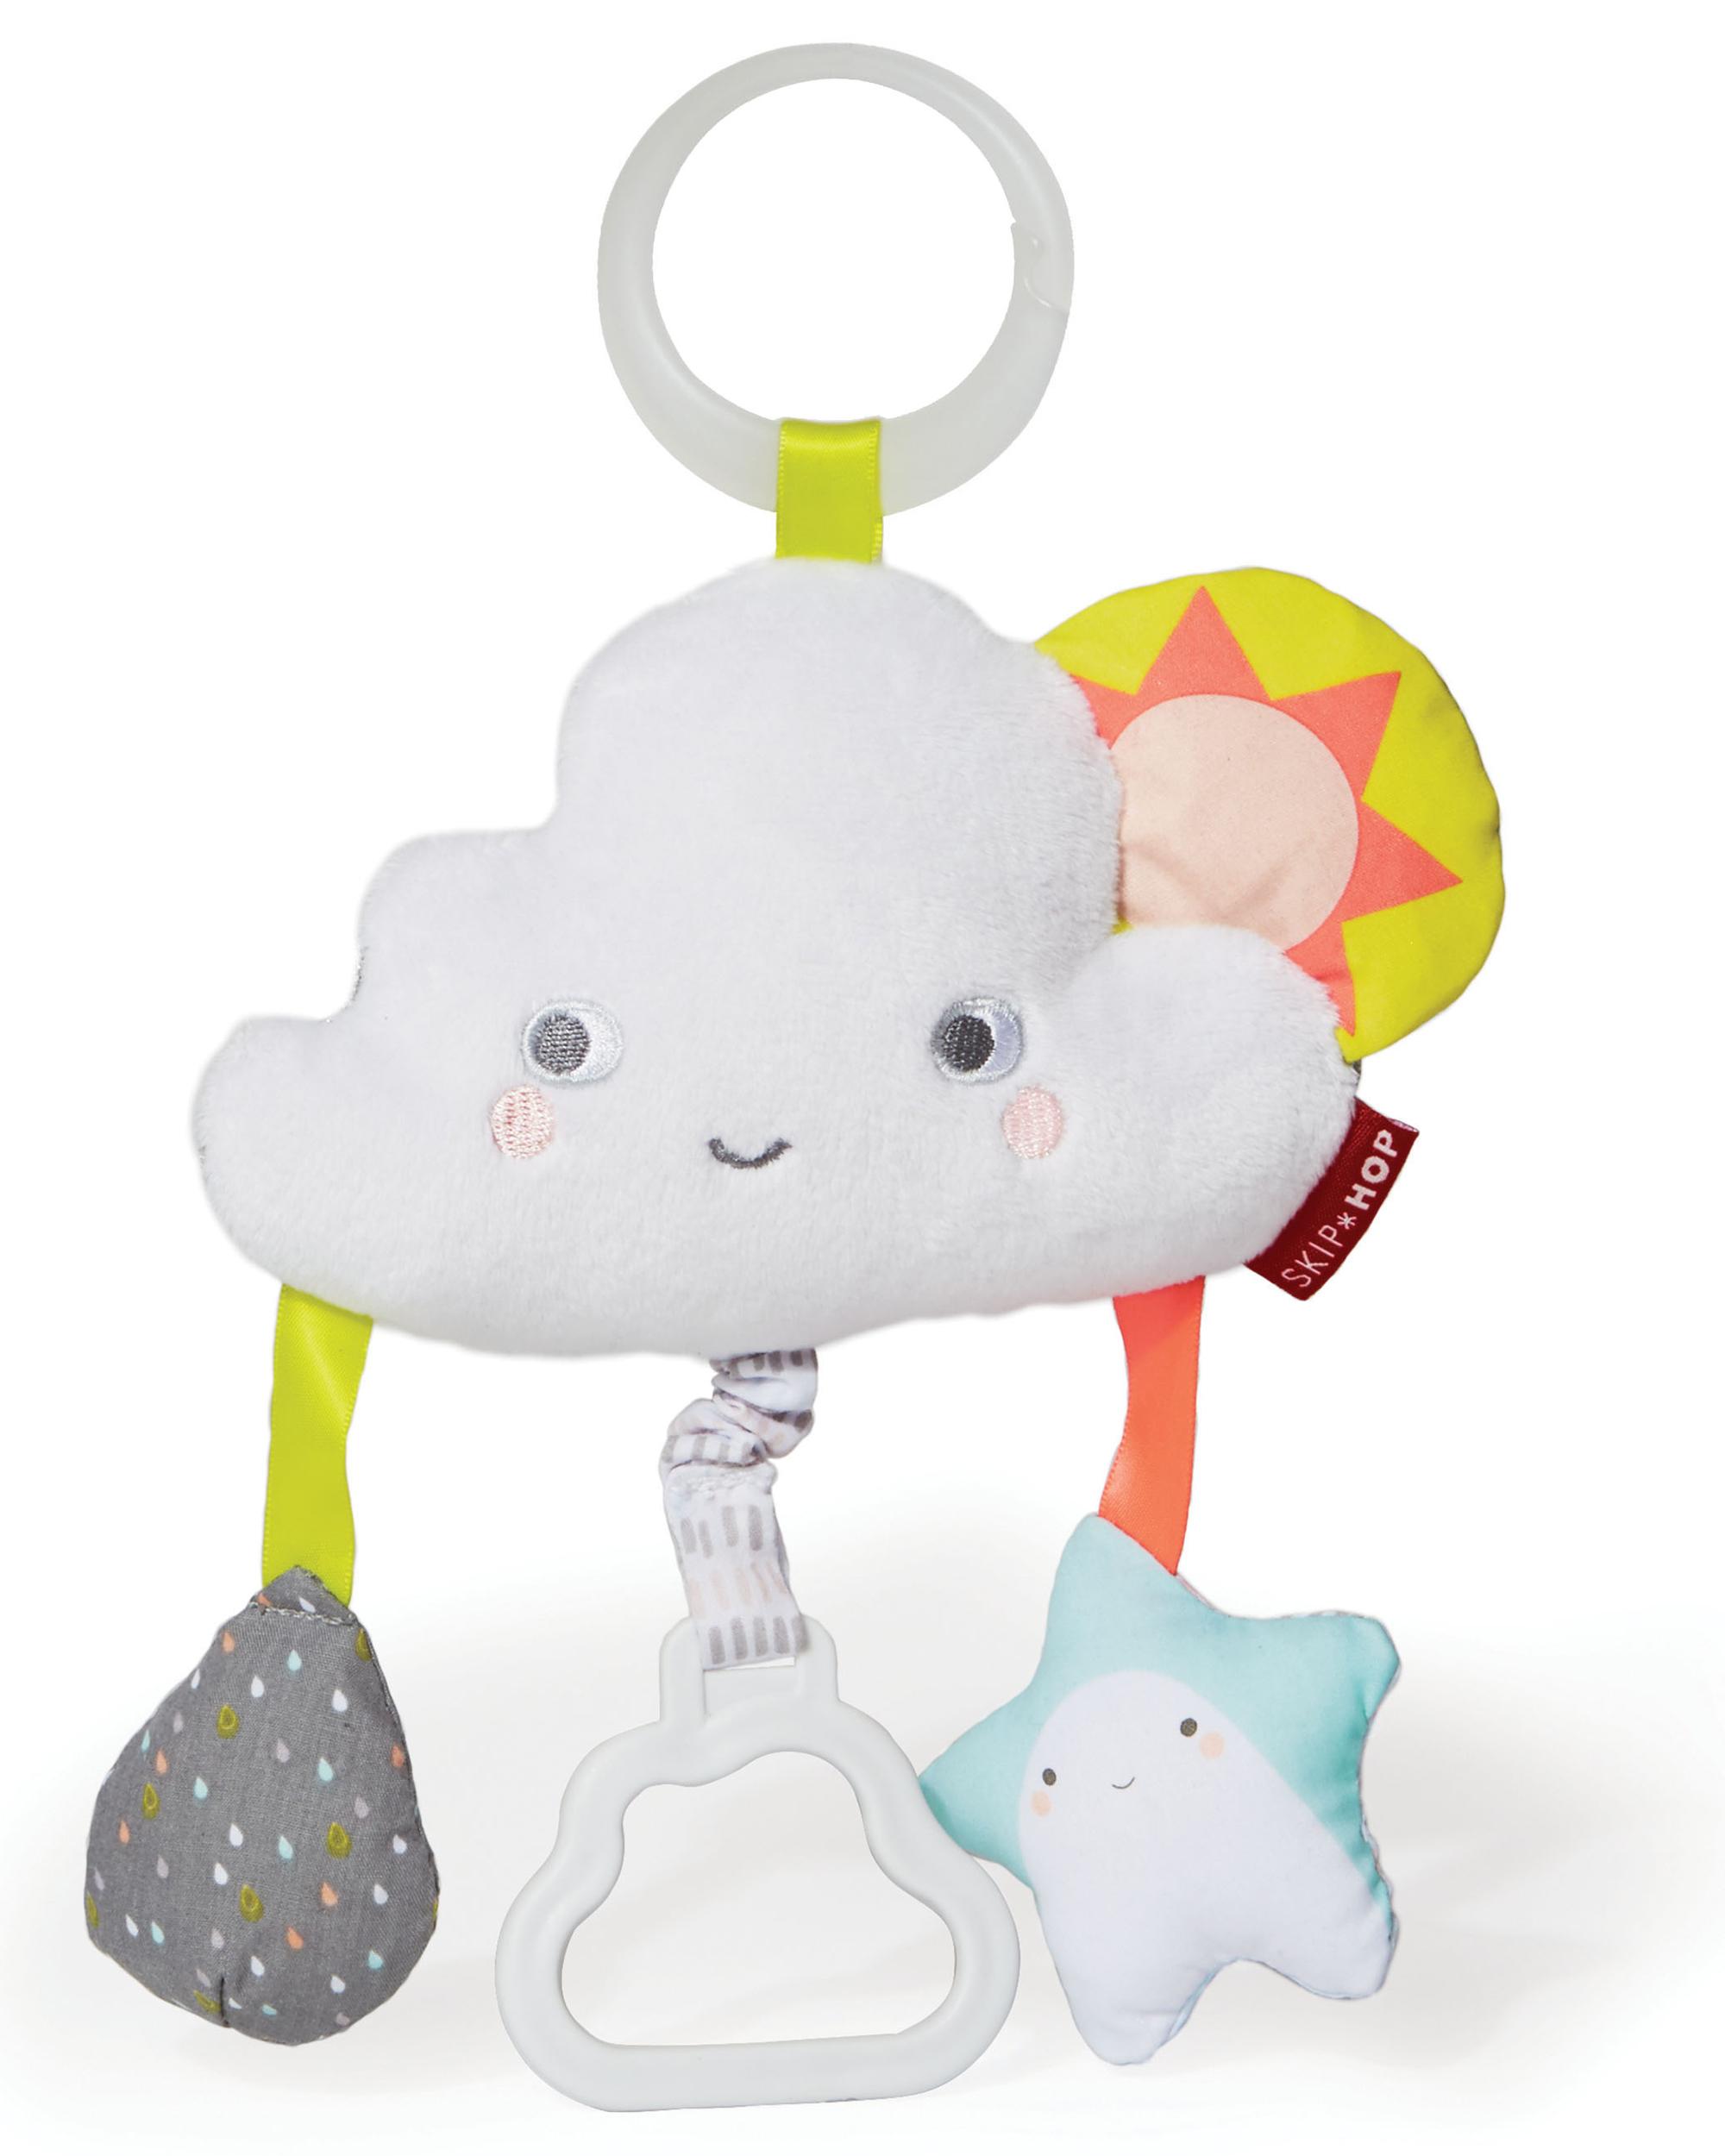 Oshkoshbgosh Silver Lining Cloud Jitter Stroller Baby Toy